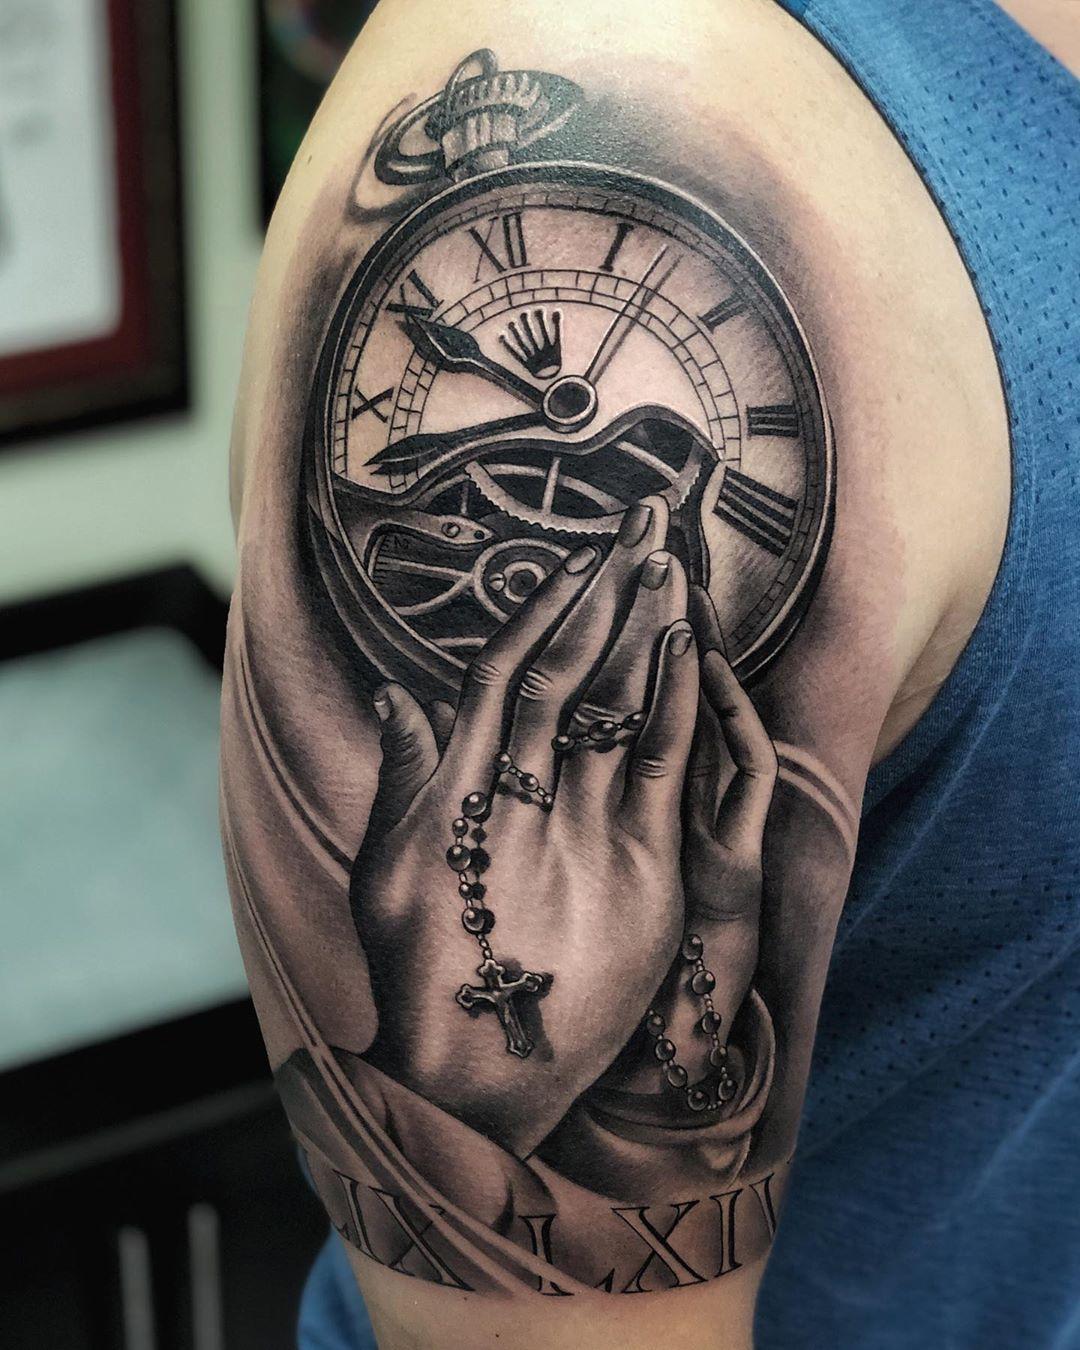 101 Amazing Praying Hands Tattoo Ideas You Will Love In 2020 Praying Hands Tattoo Hand Tattoos Praying Hands Tattoo Design